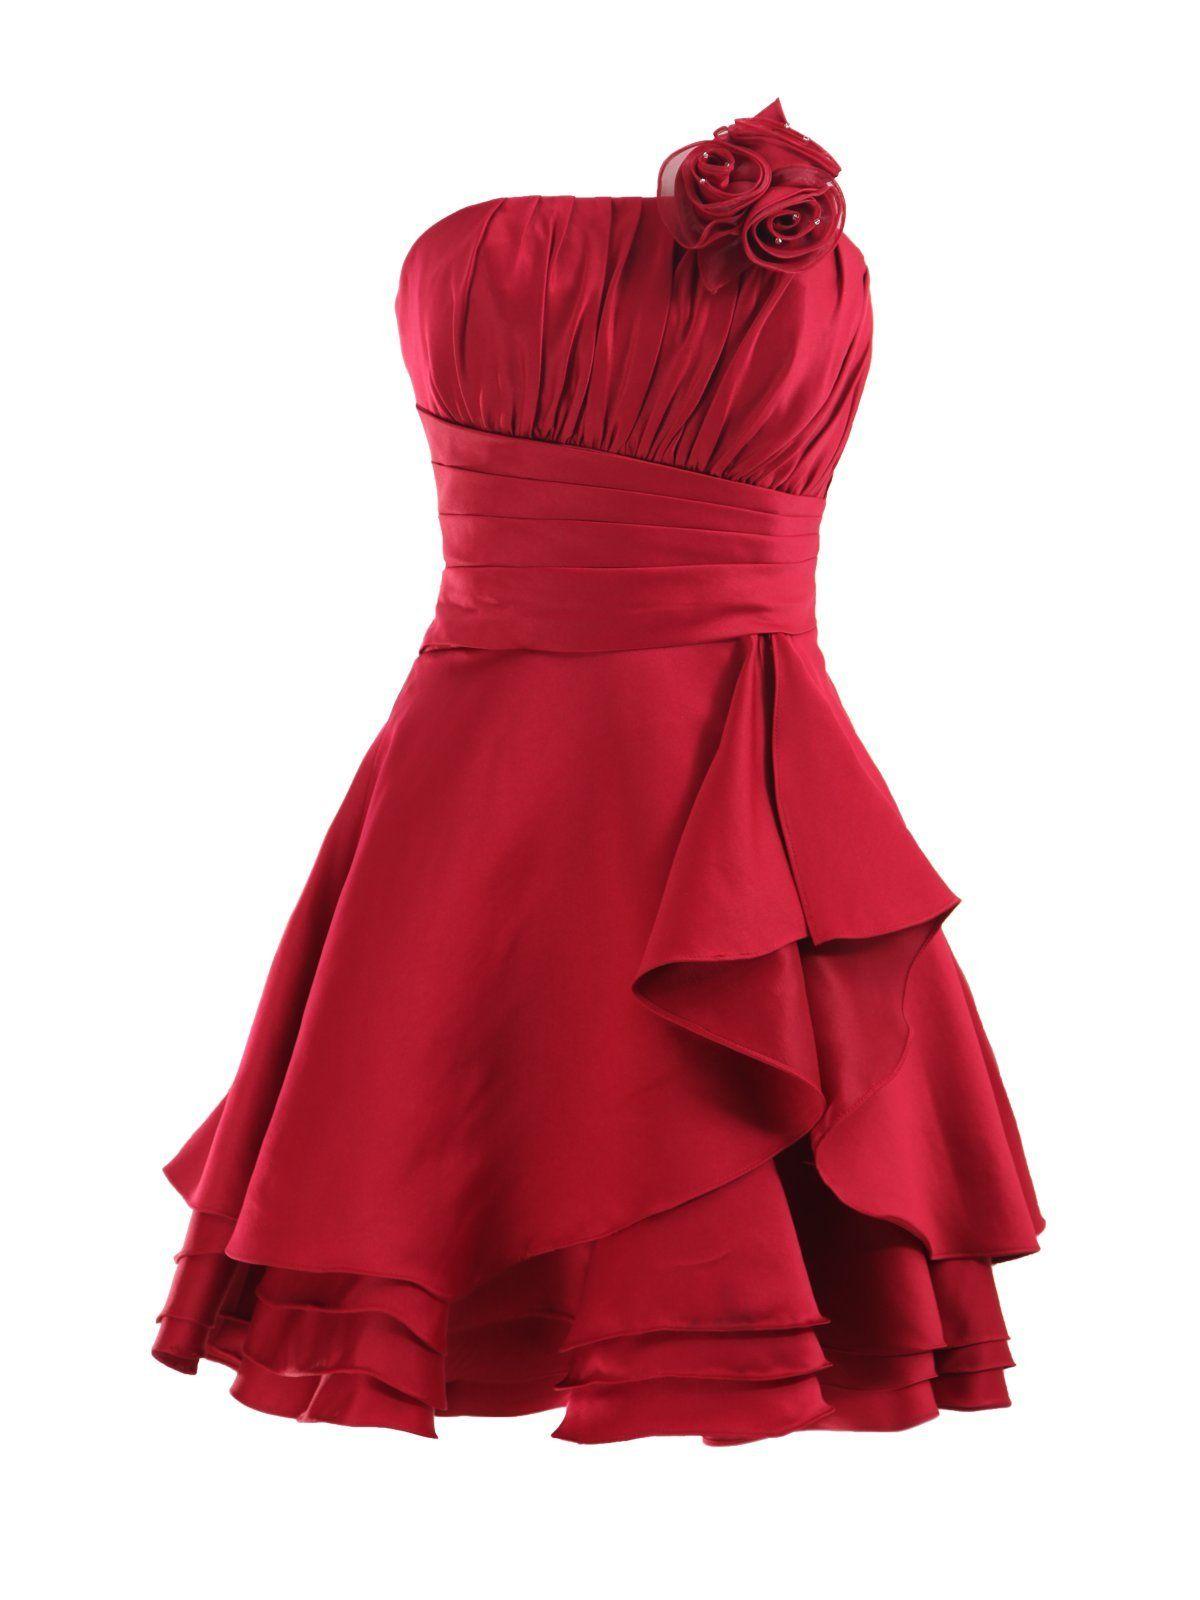 Red and black wedding dress  Landybridal Corset Knee Length A Line Satin Party Dress E L